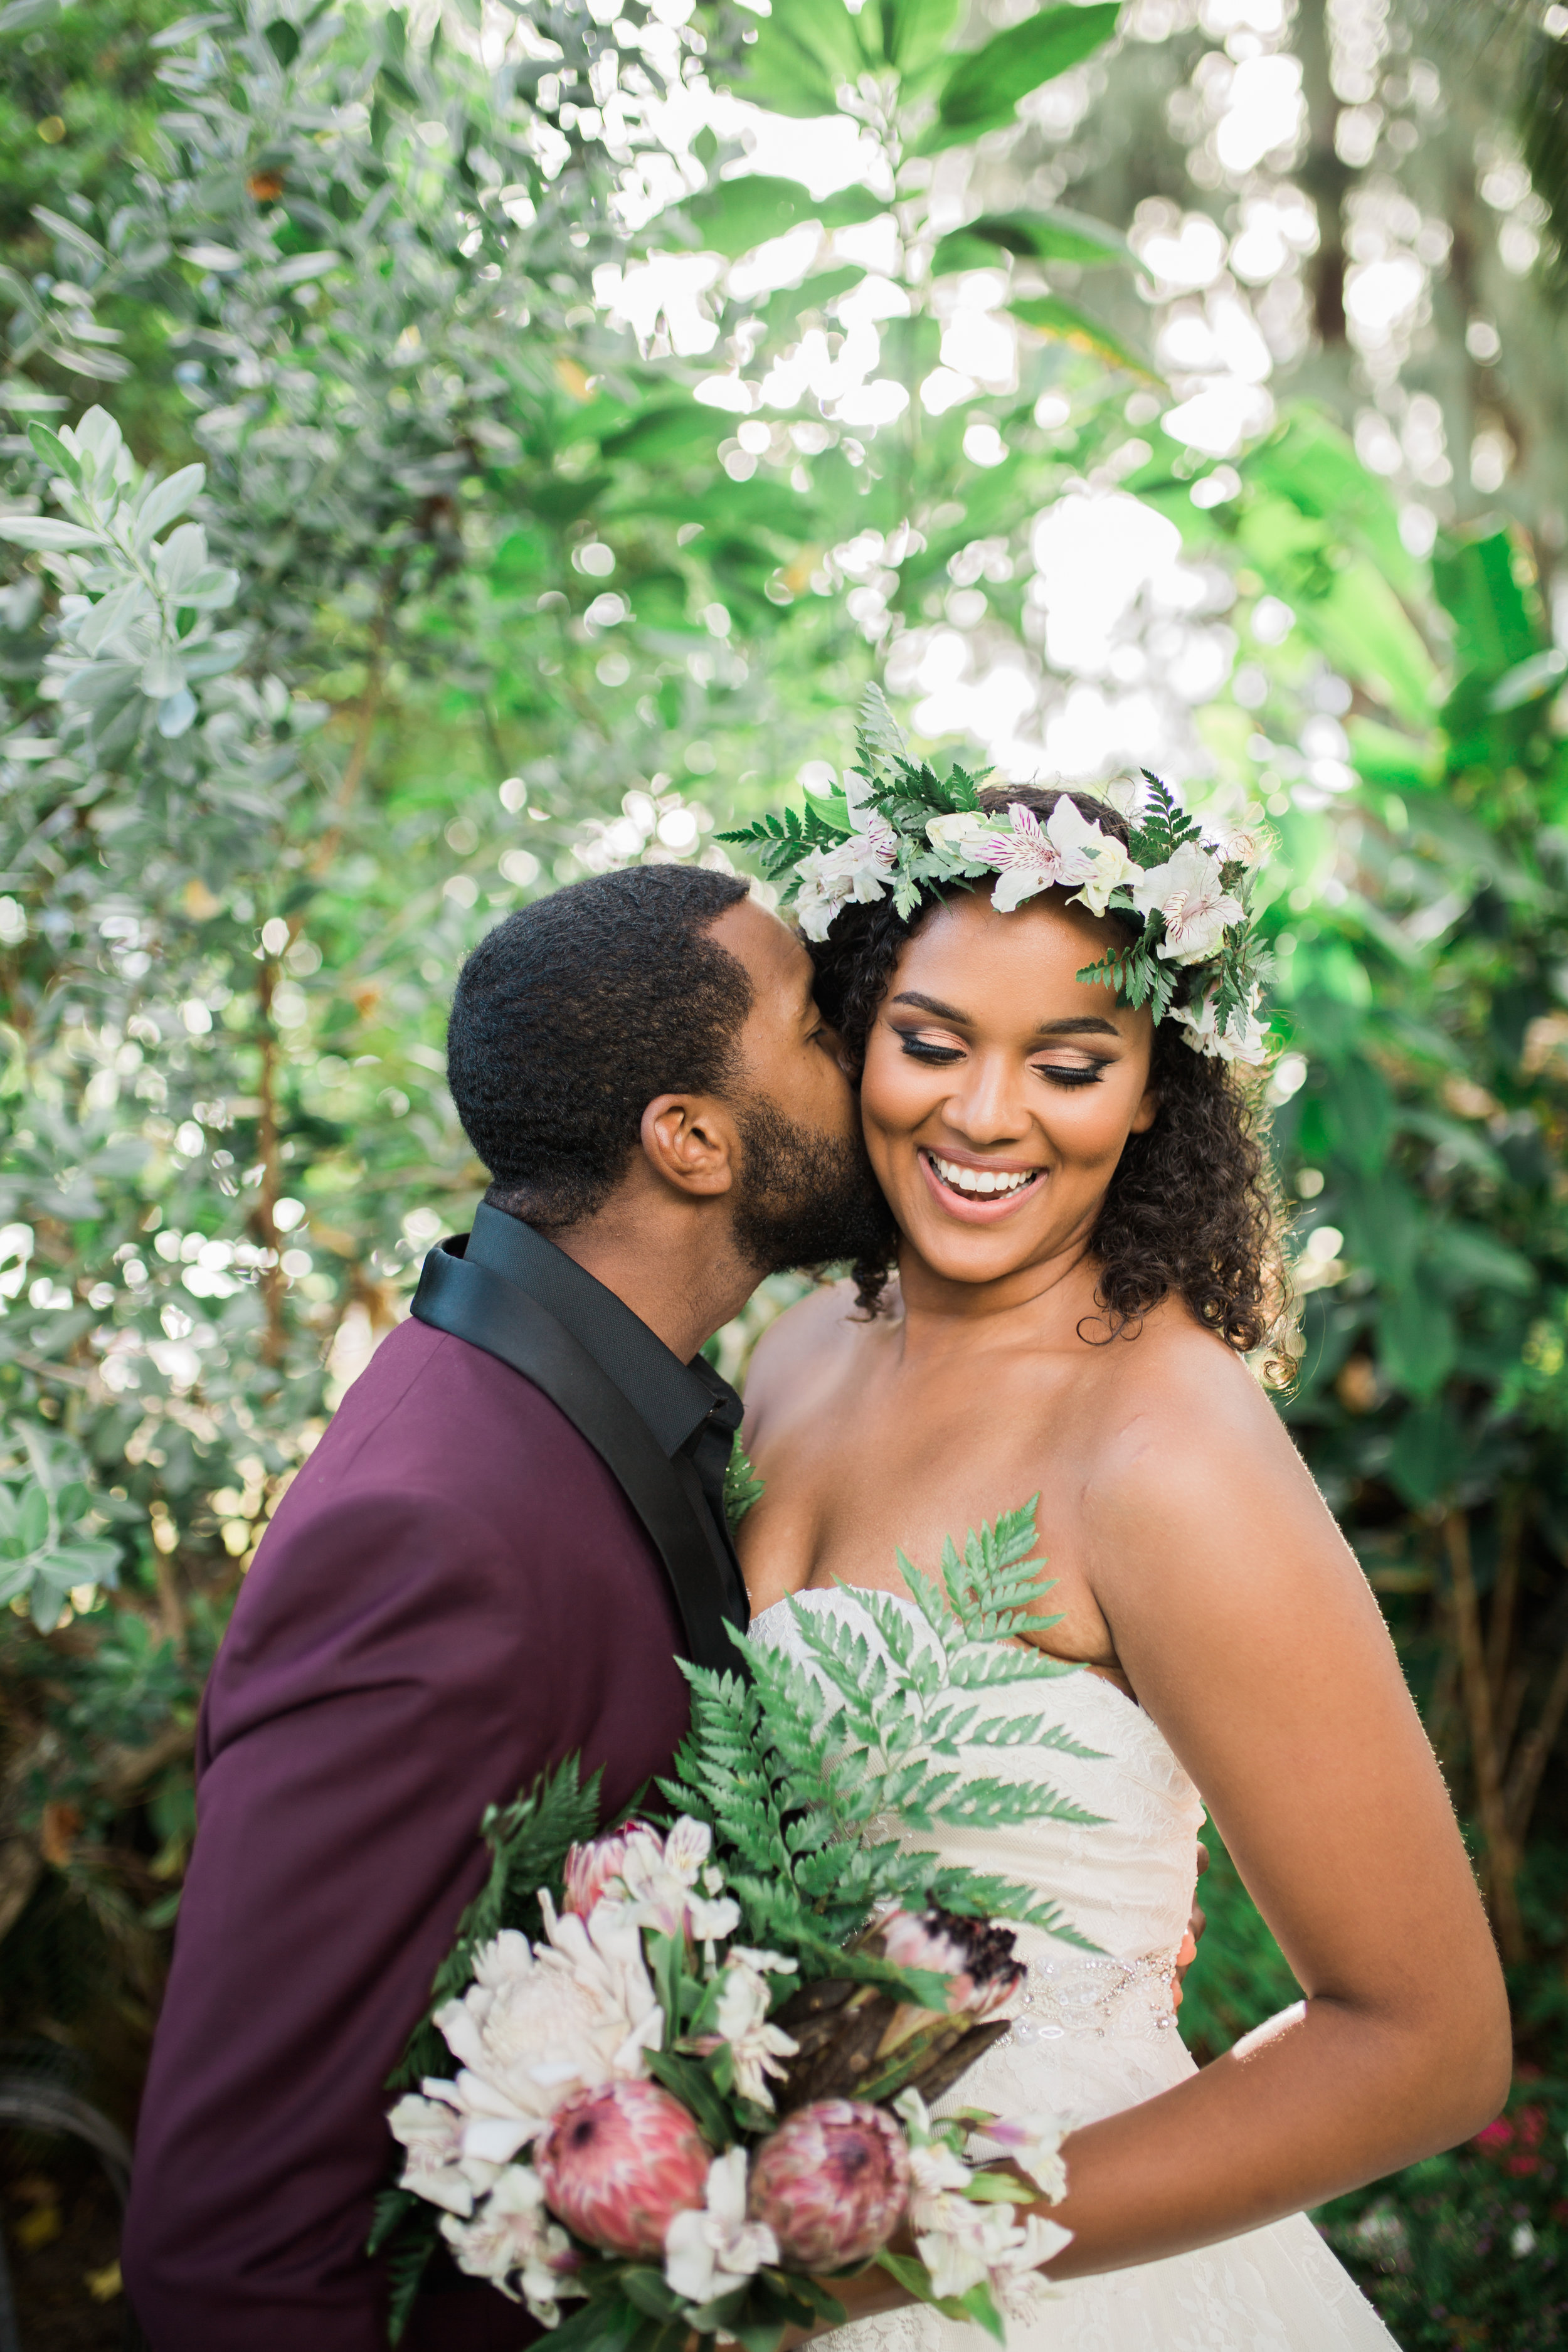 Gardens-BrideGroomGardens2 _Vanessa Hicks Photography-8744.jpg